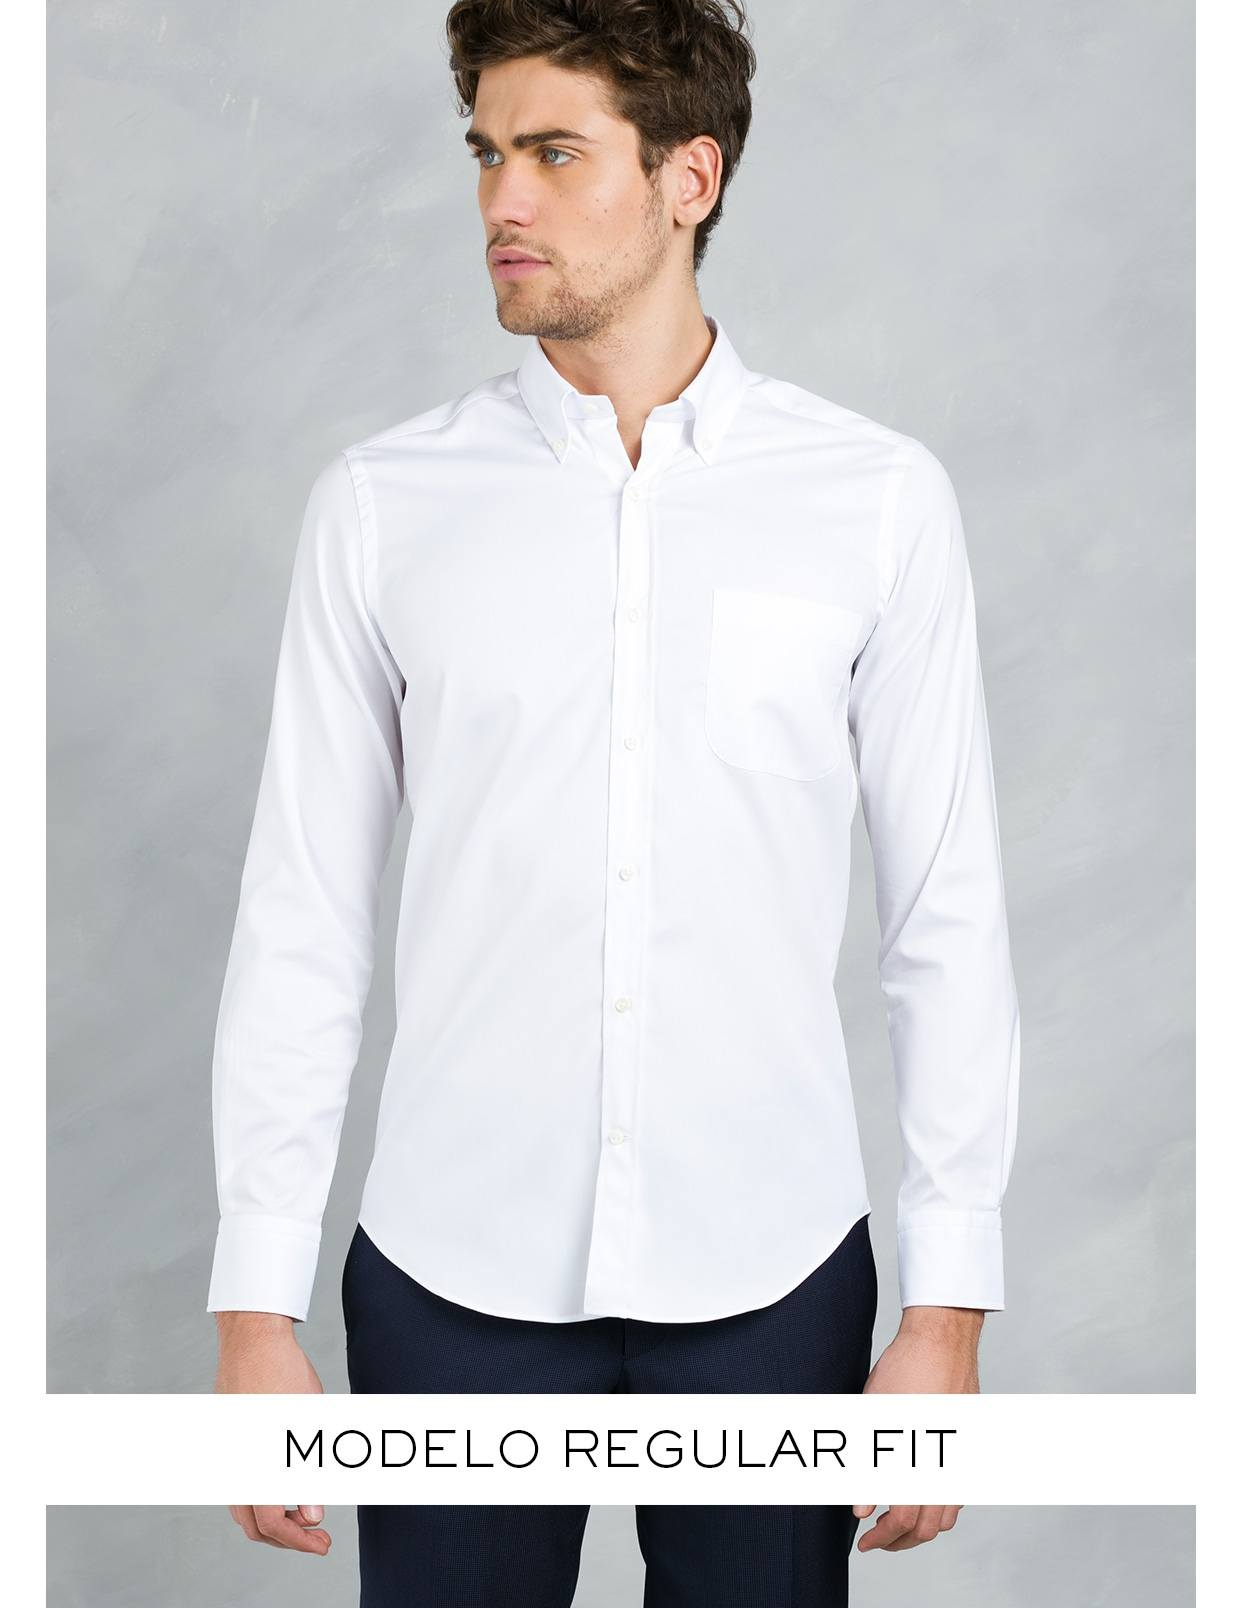 Camisa Formal Wear REGULAR FIT modelo BOTTON DOWN color azul , 100% Algodón. - Ítem3